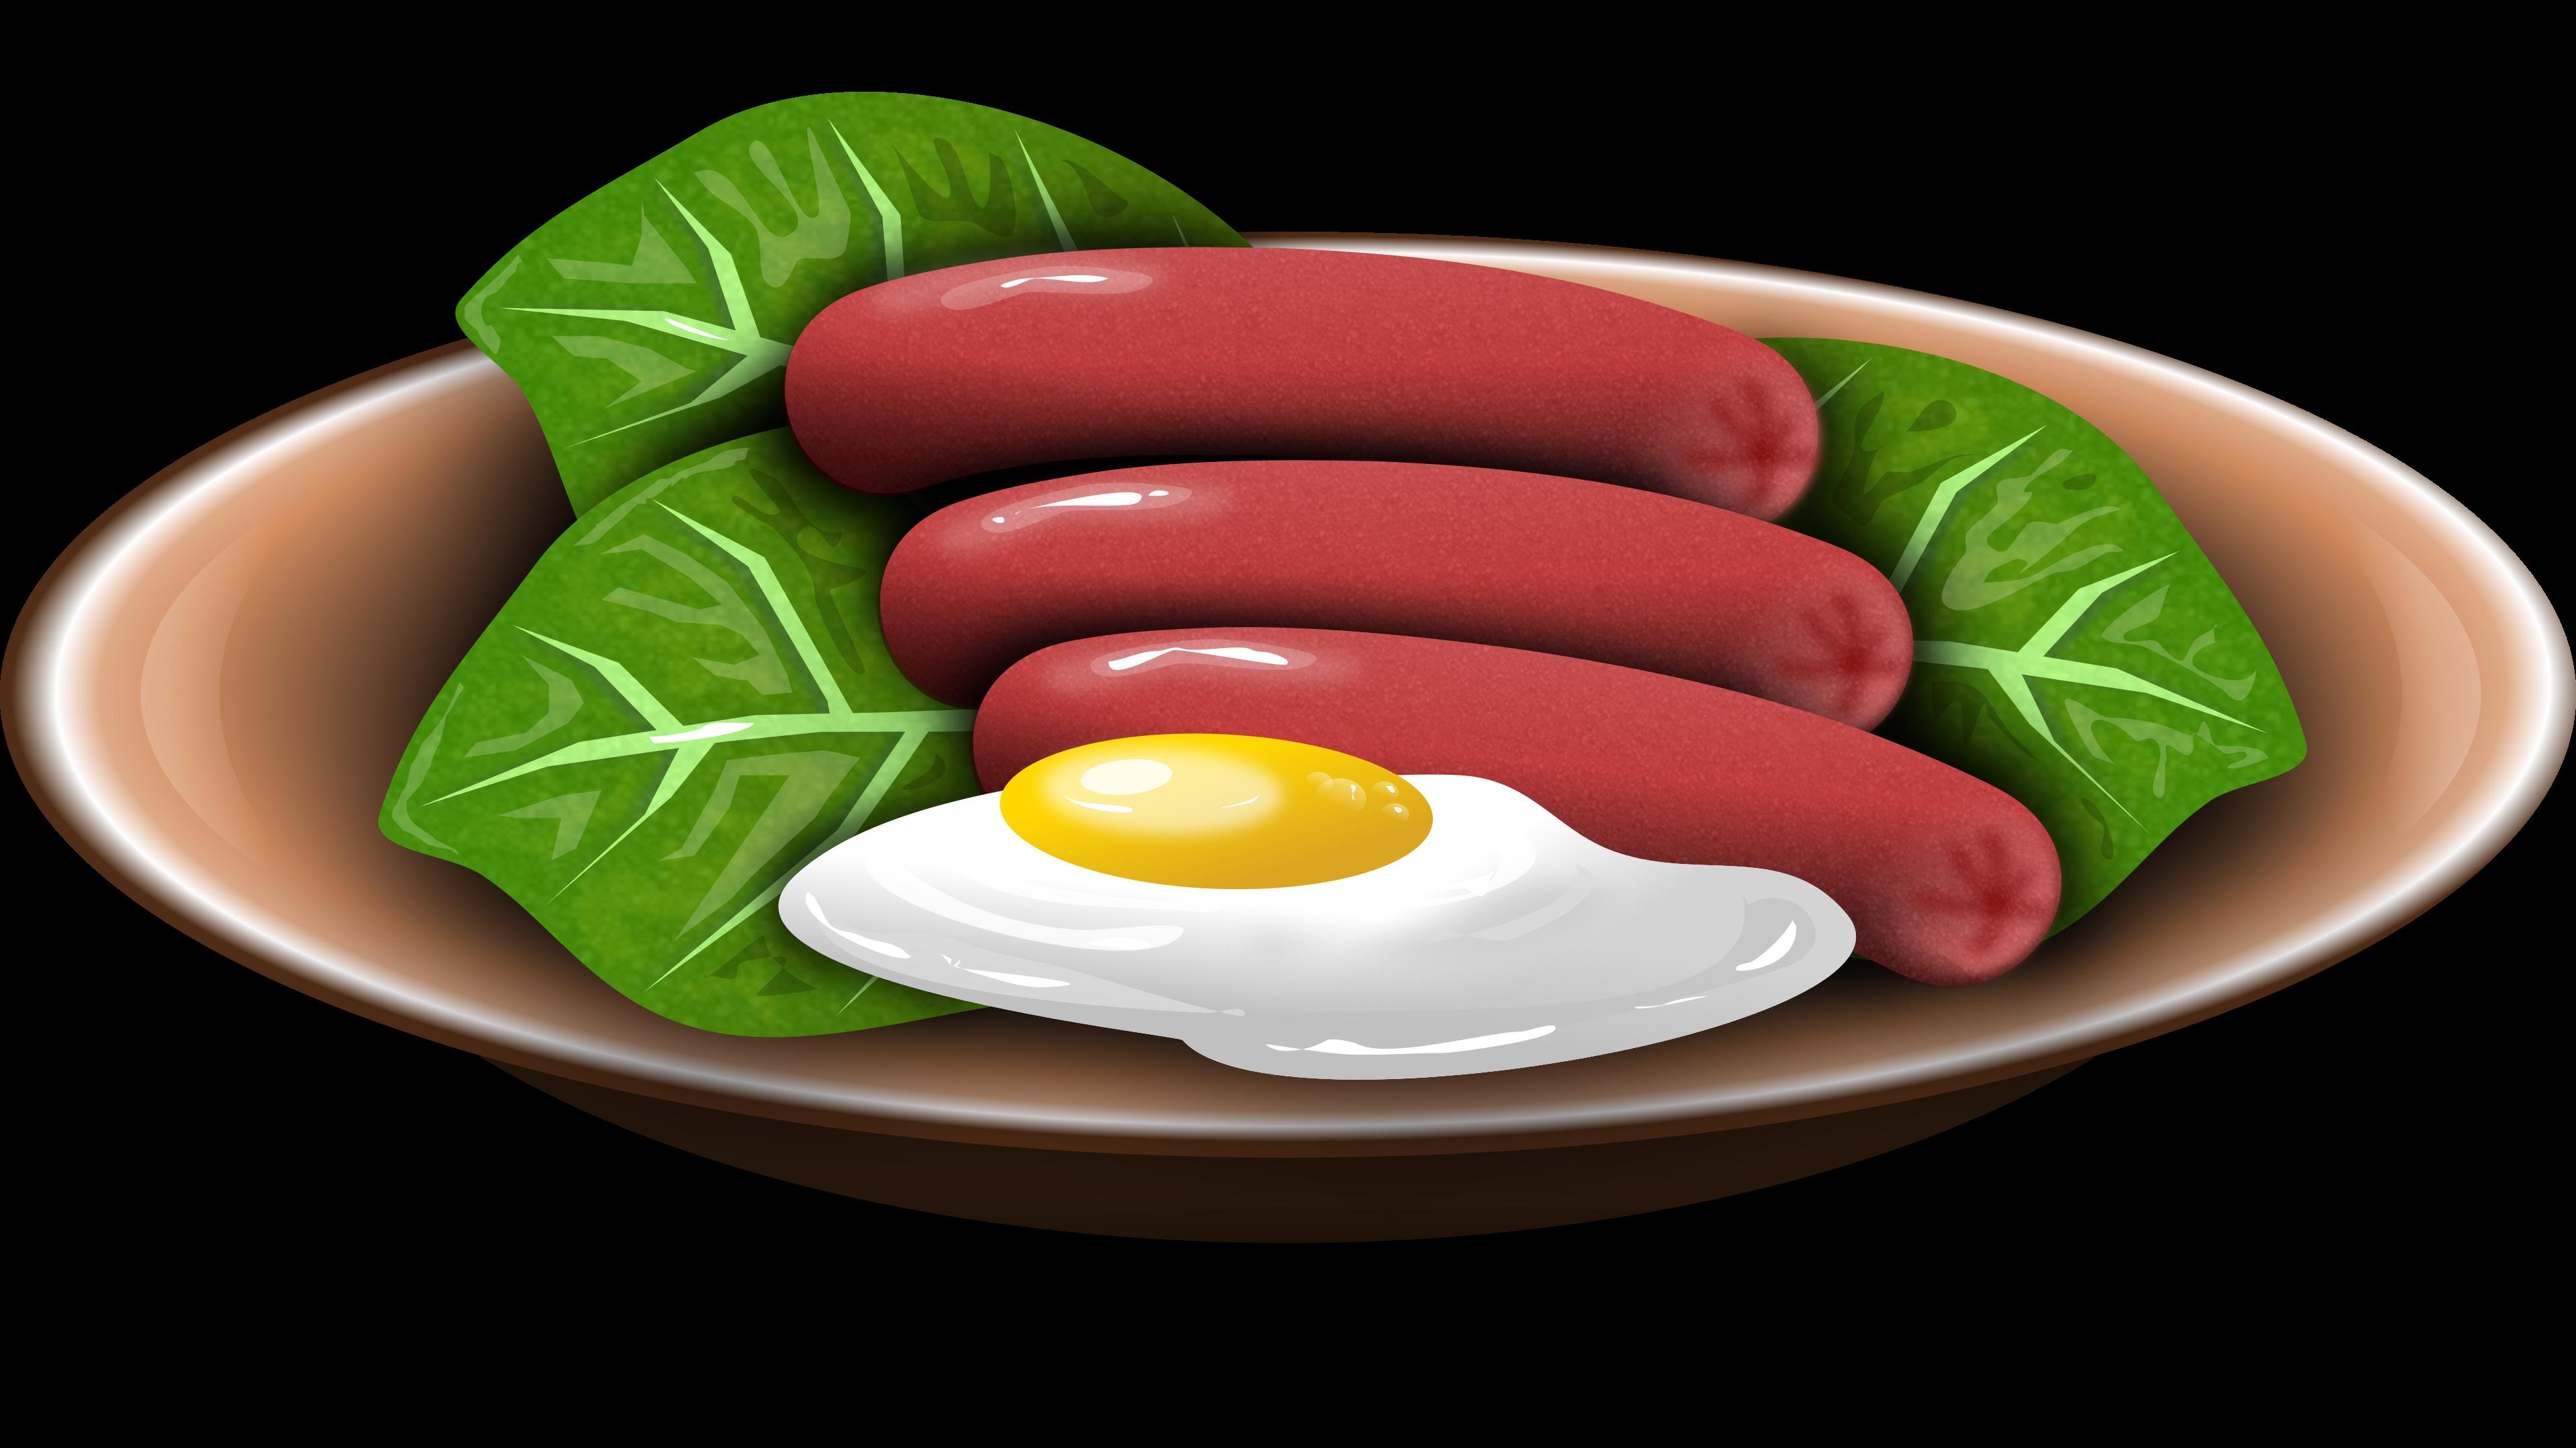 Hotdog clipart simple food. Hotdogs and fried egg